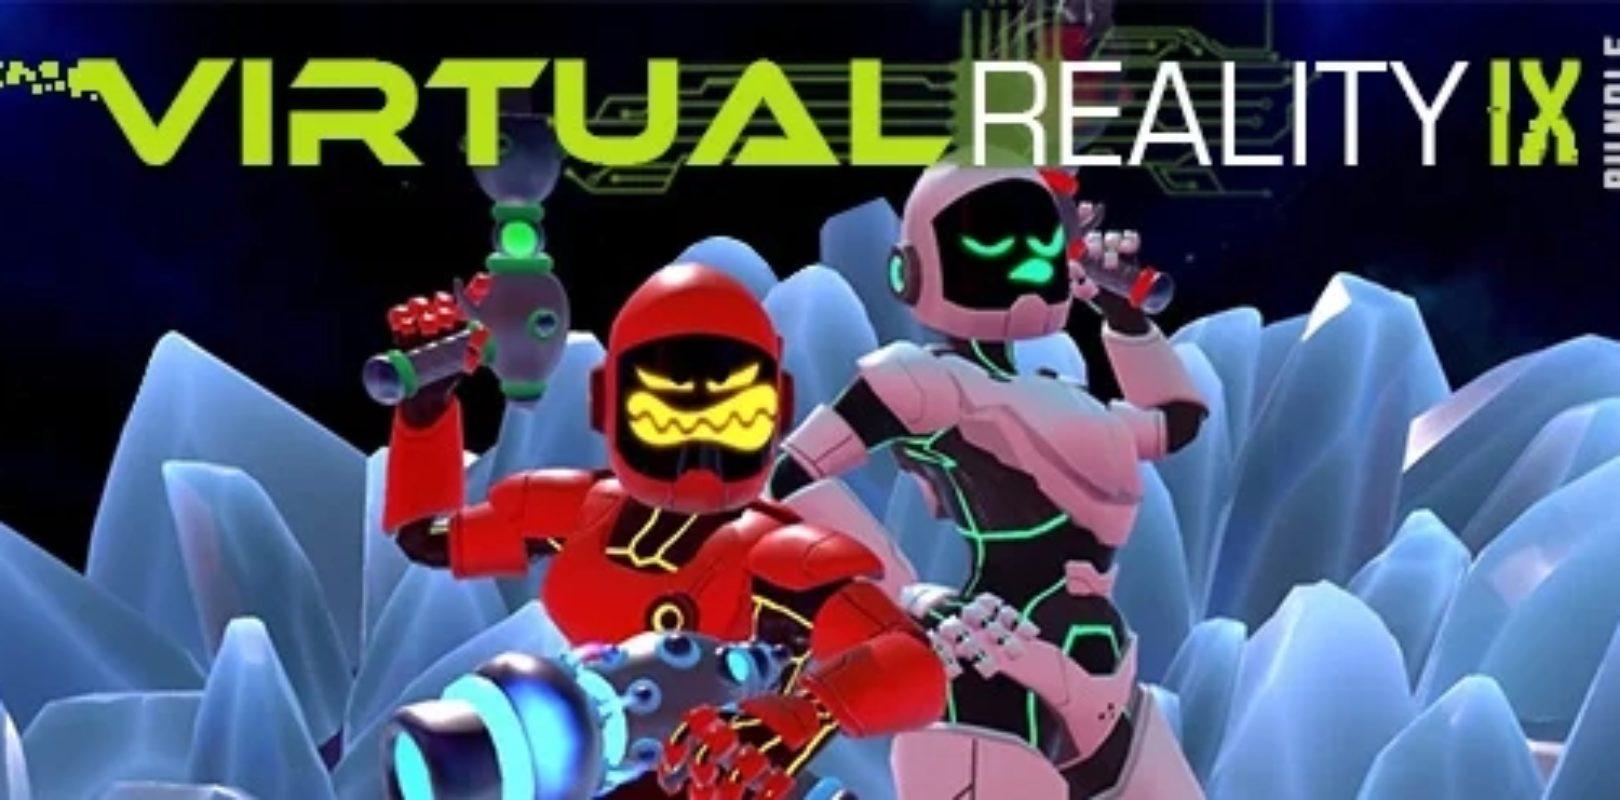 Indiegala VR 9 Steam VR Giveaway via reddit! - THE VR GRID